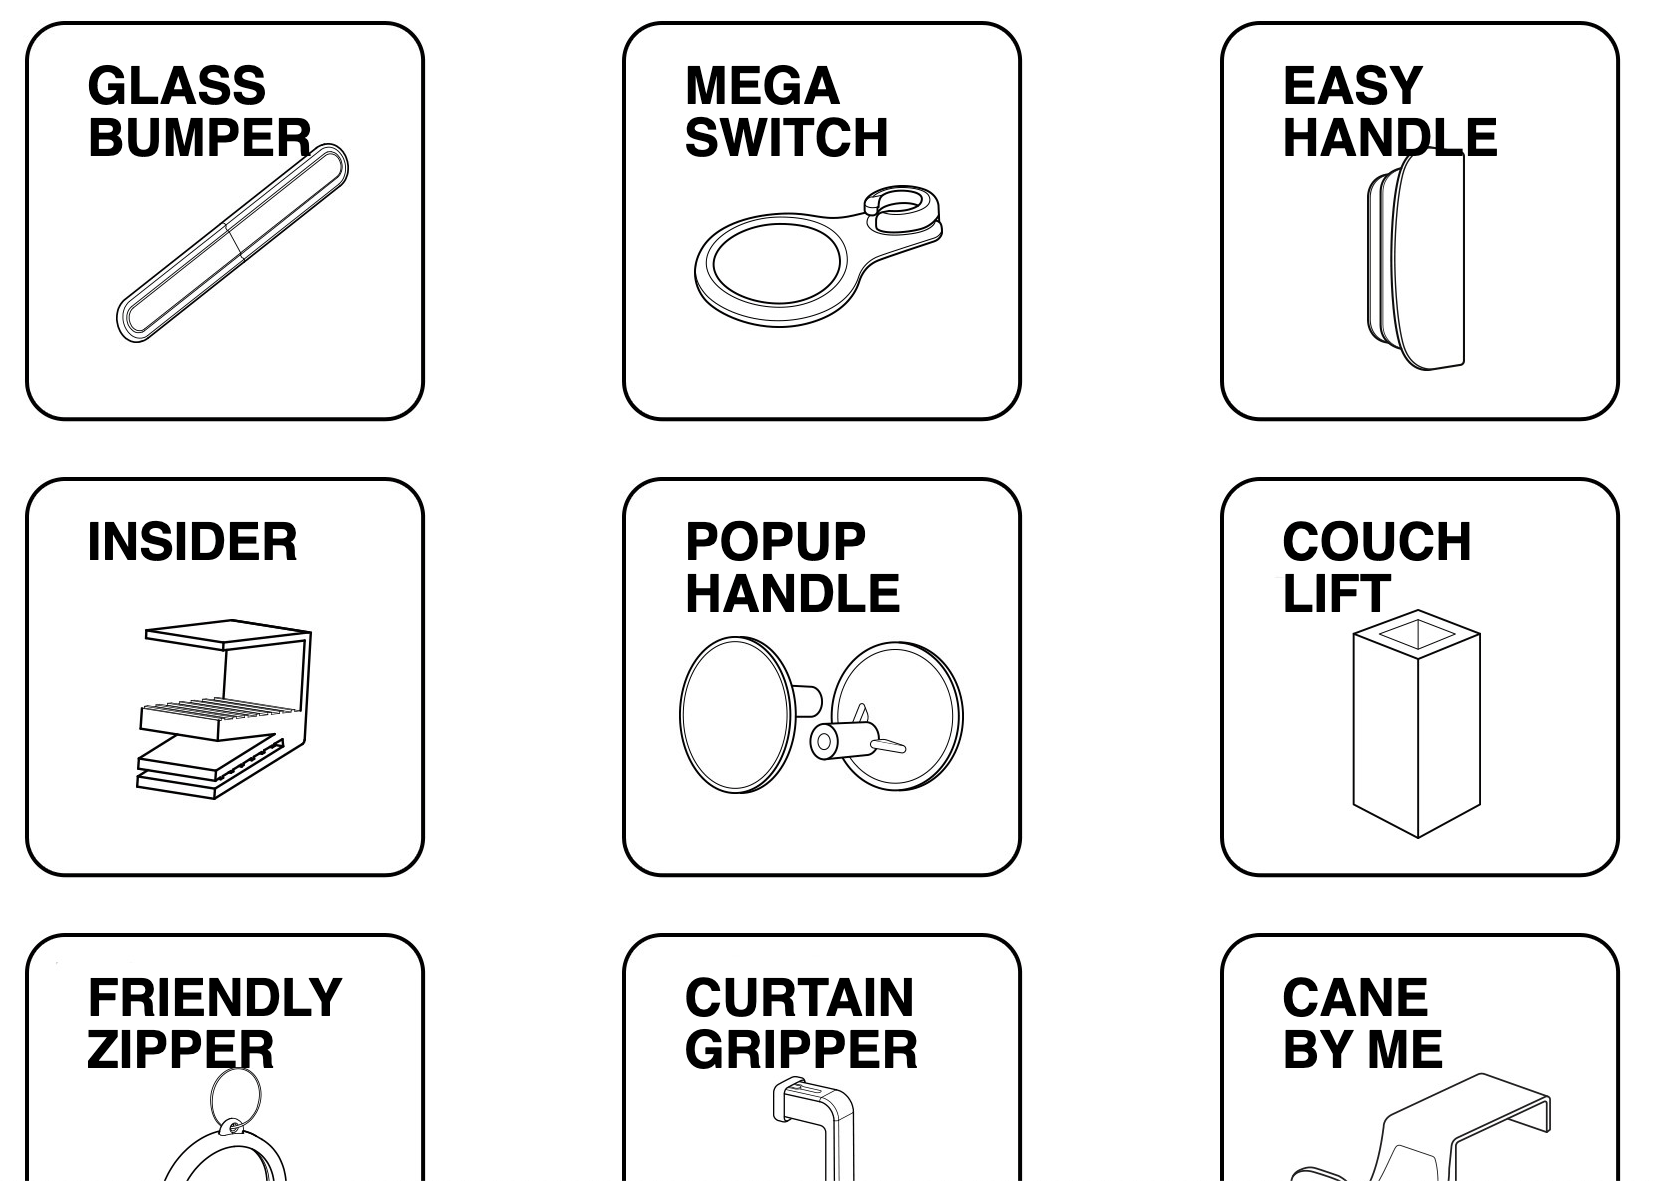 Ikea 3D printed low tech assistive technology